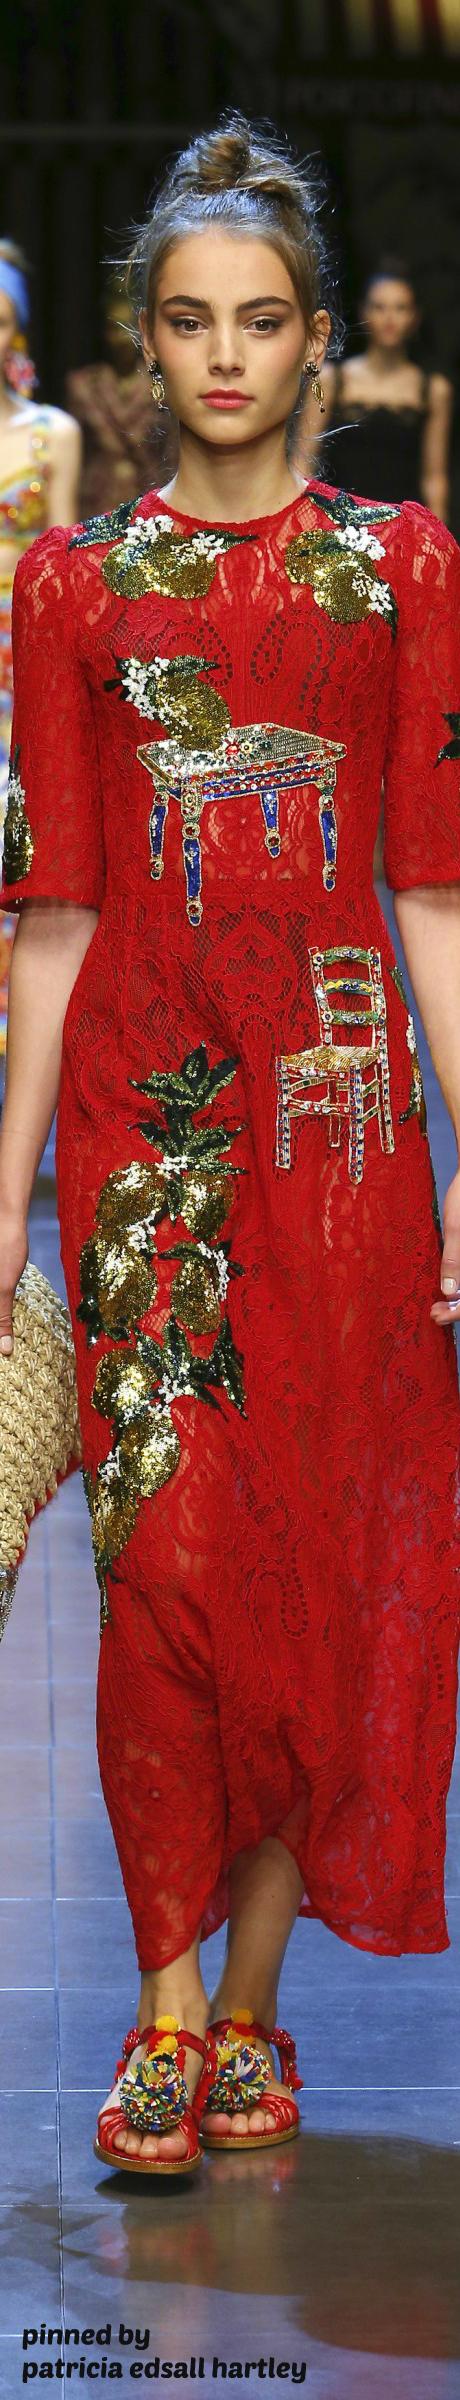 Dolce & Gabbana - SS 2016 http://www.dolcegabbana.com/